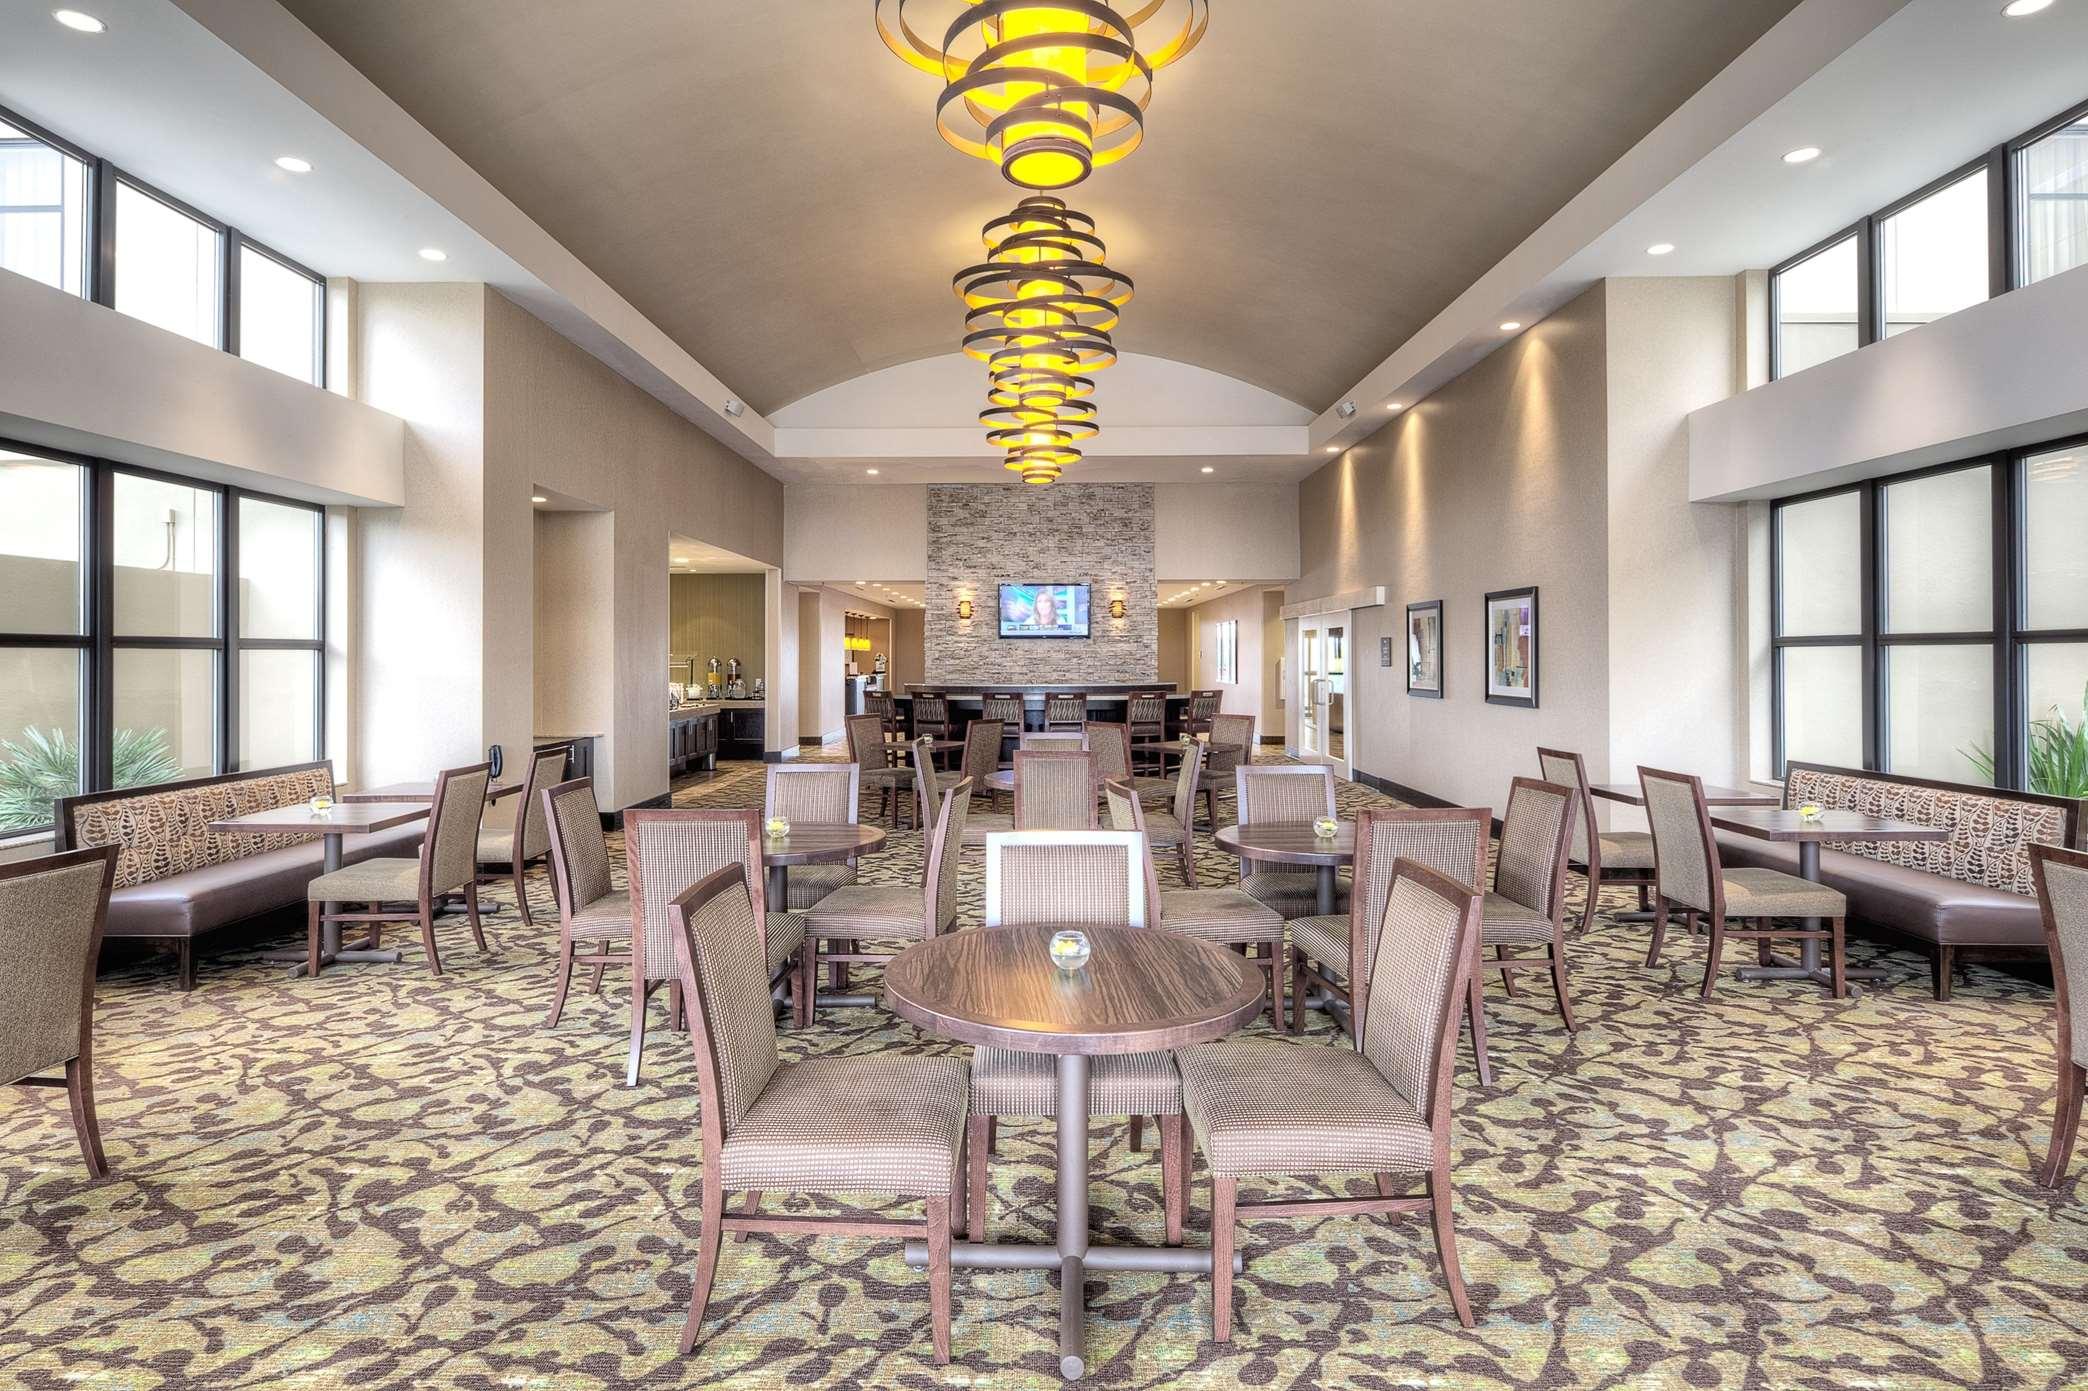 Homewood Suites by Hilton Victoria, TX image 9